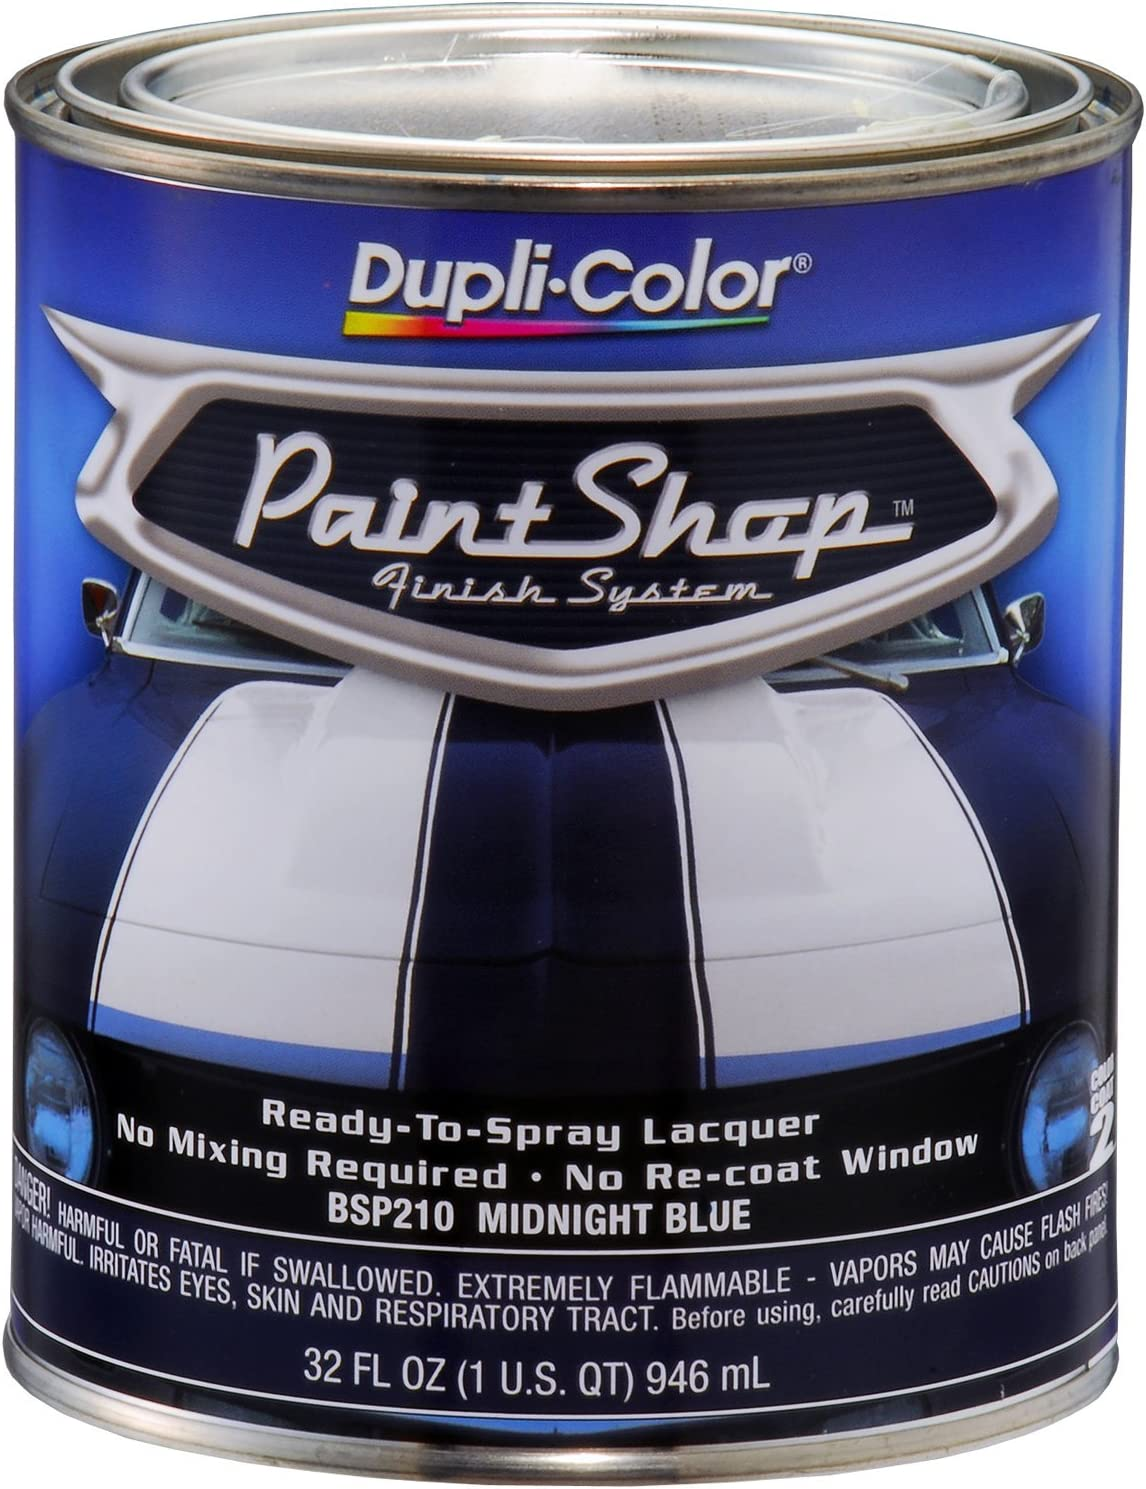 Dupli Color Bsp210 2 Pk Paint Shop Midnight Blue Finish System Base Coat 1 Quart Case Of 2